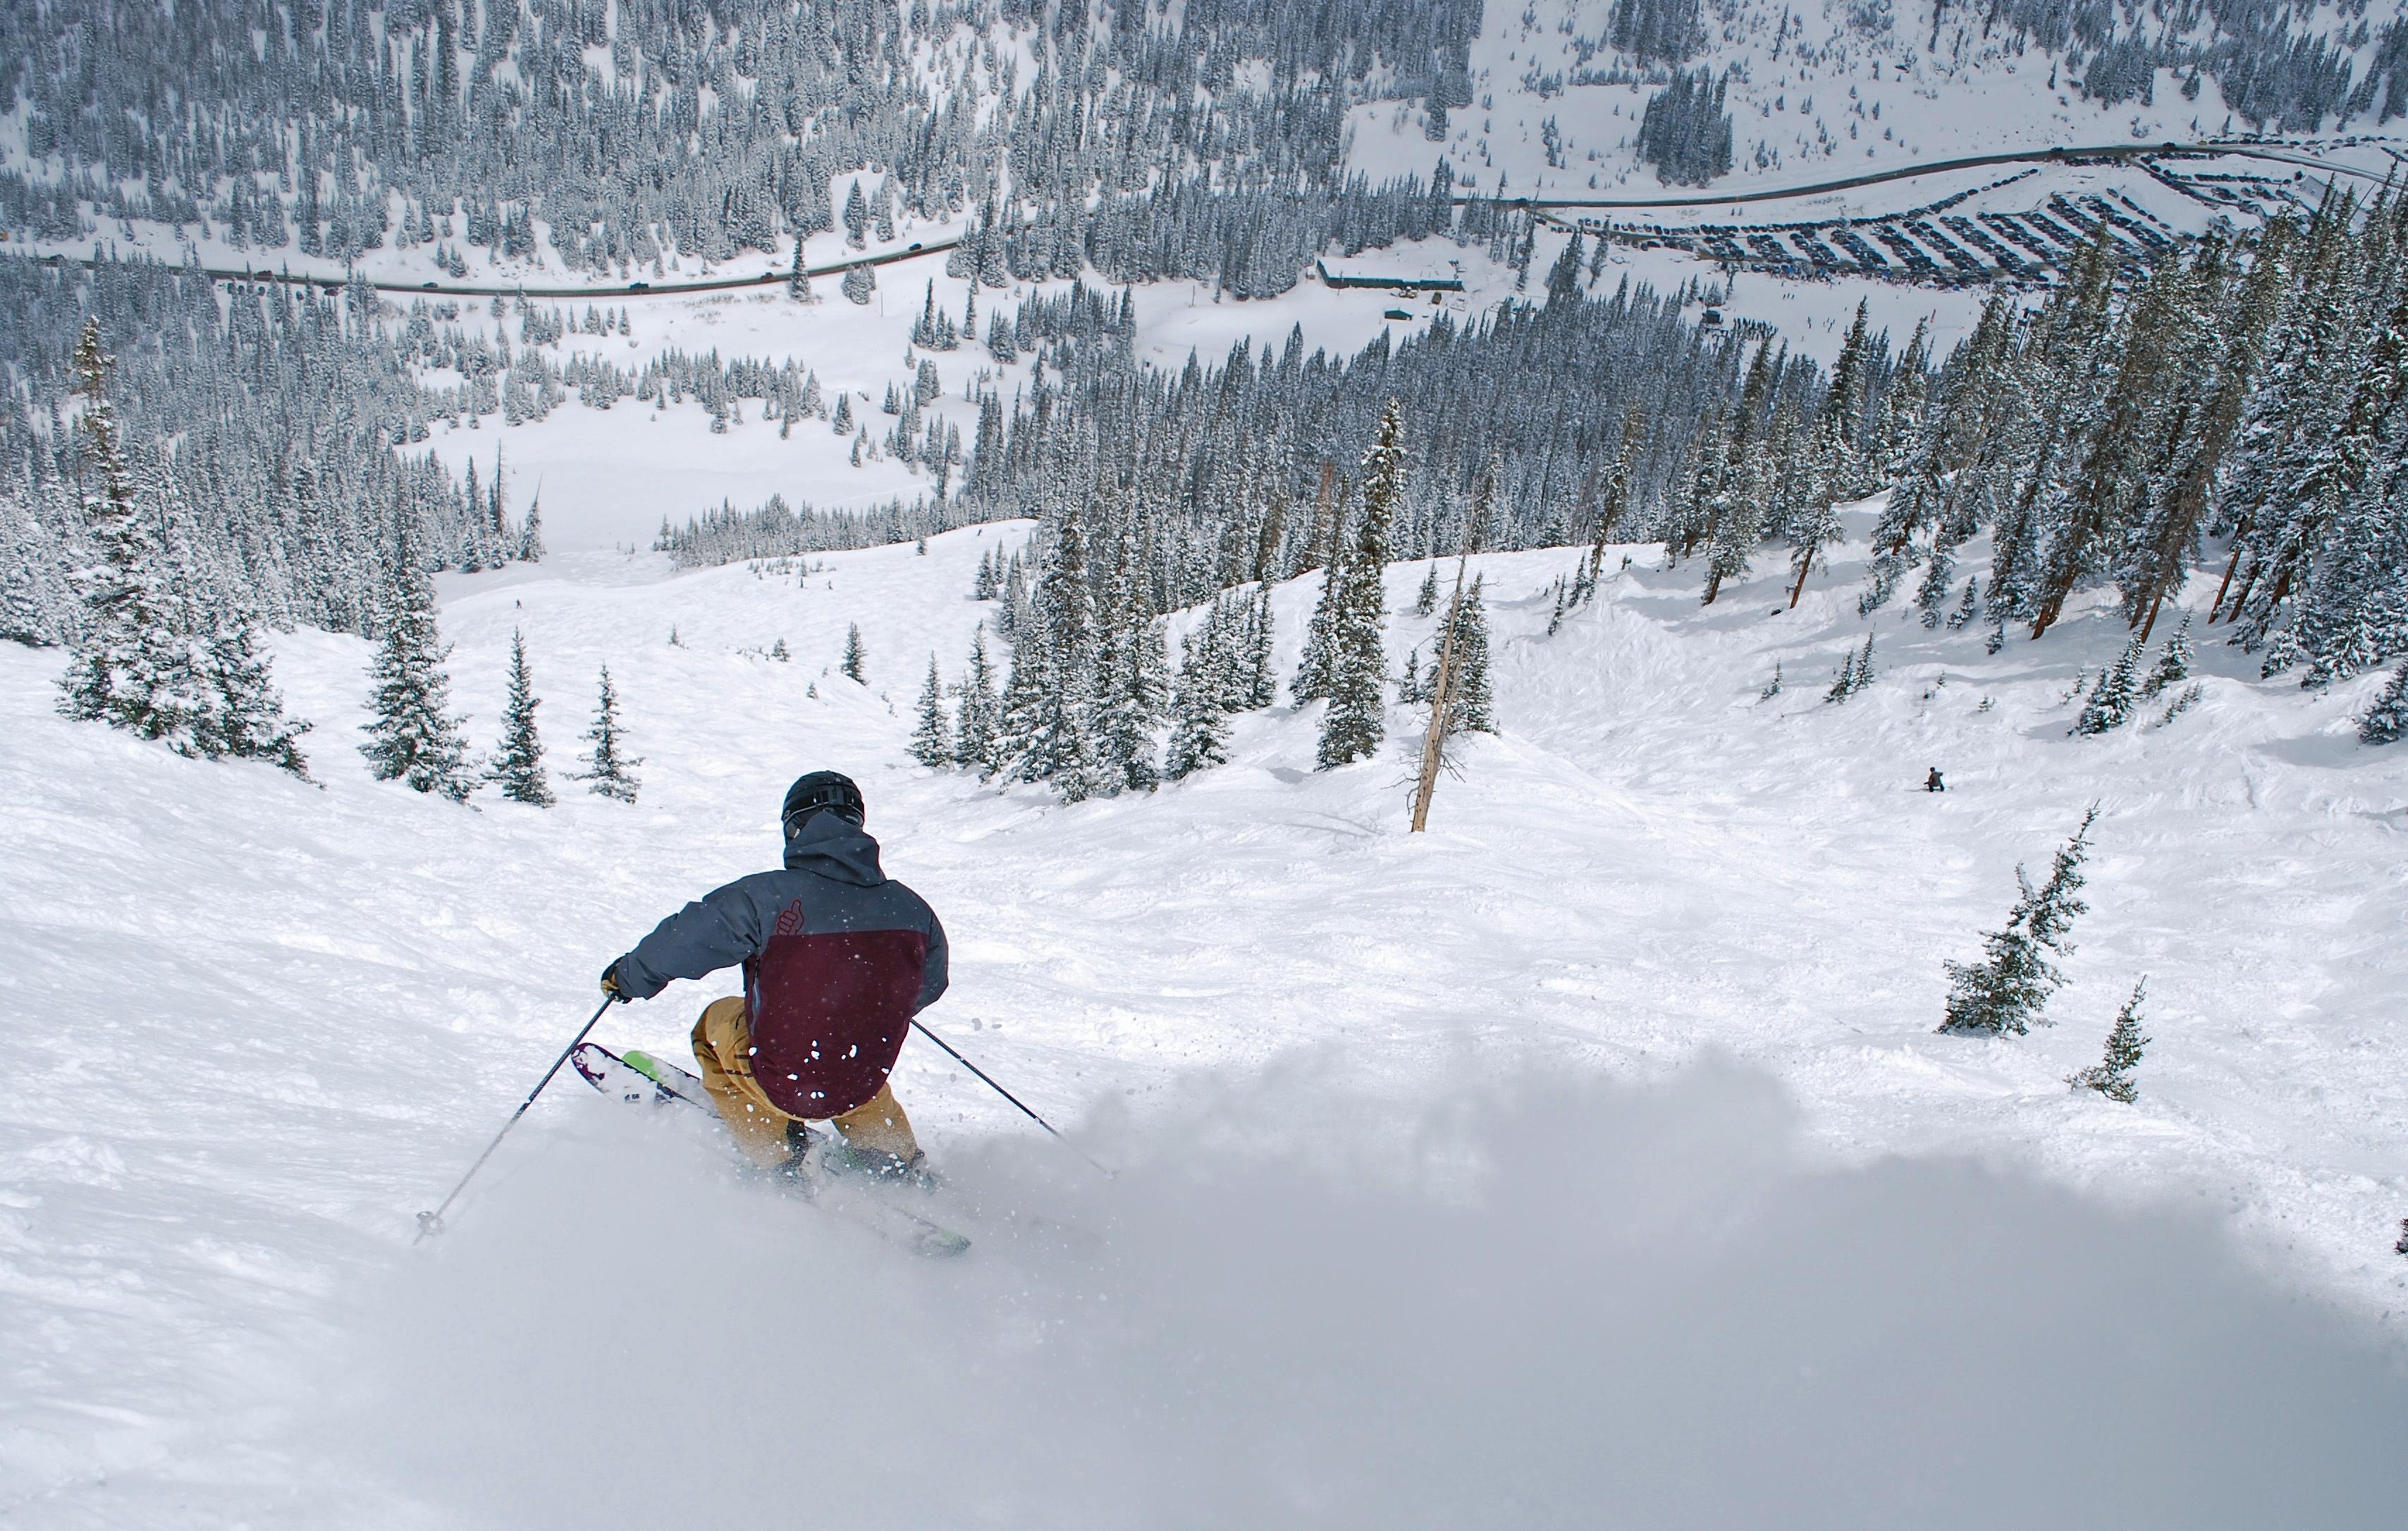 AMPerage Ski Testing In The Jackson Hole Backcountry